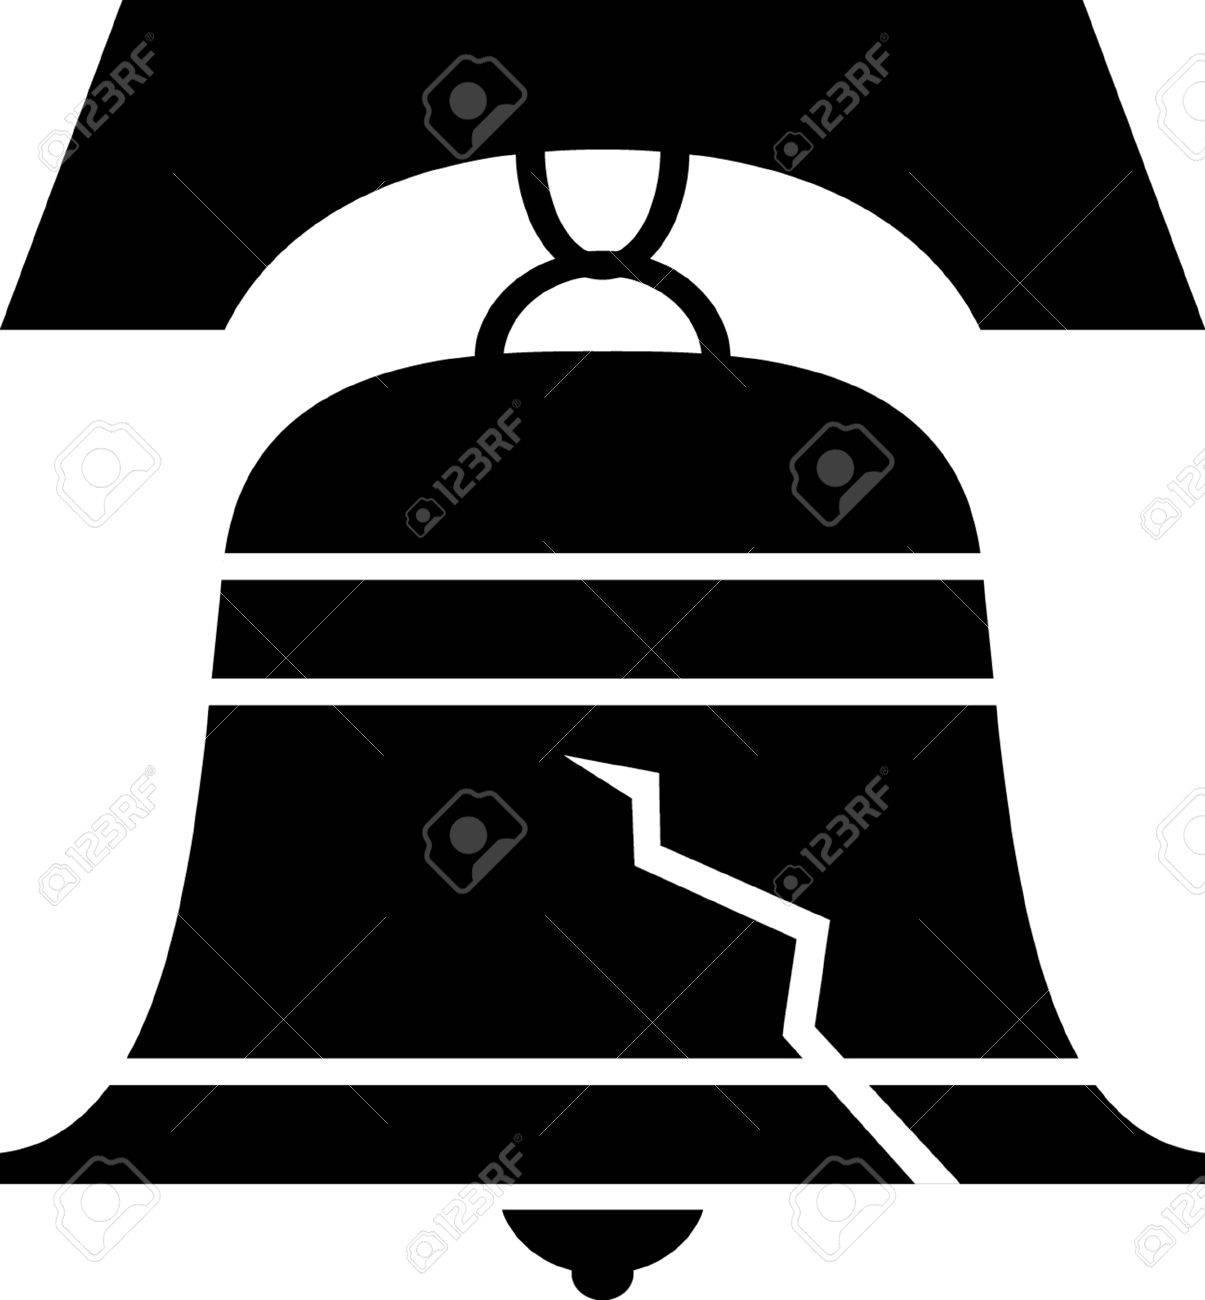 liberty bell royalty free cliparts vectors and stock illustration rh 123rf com